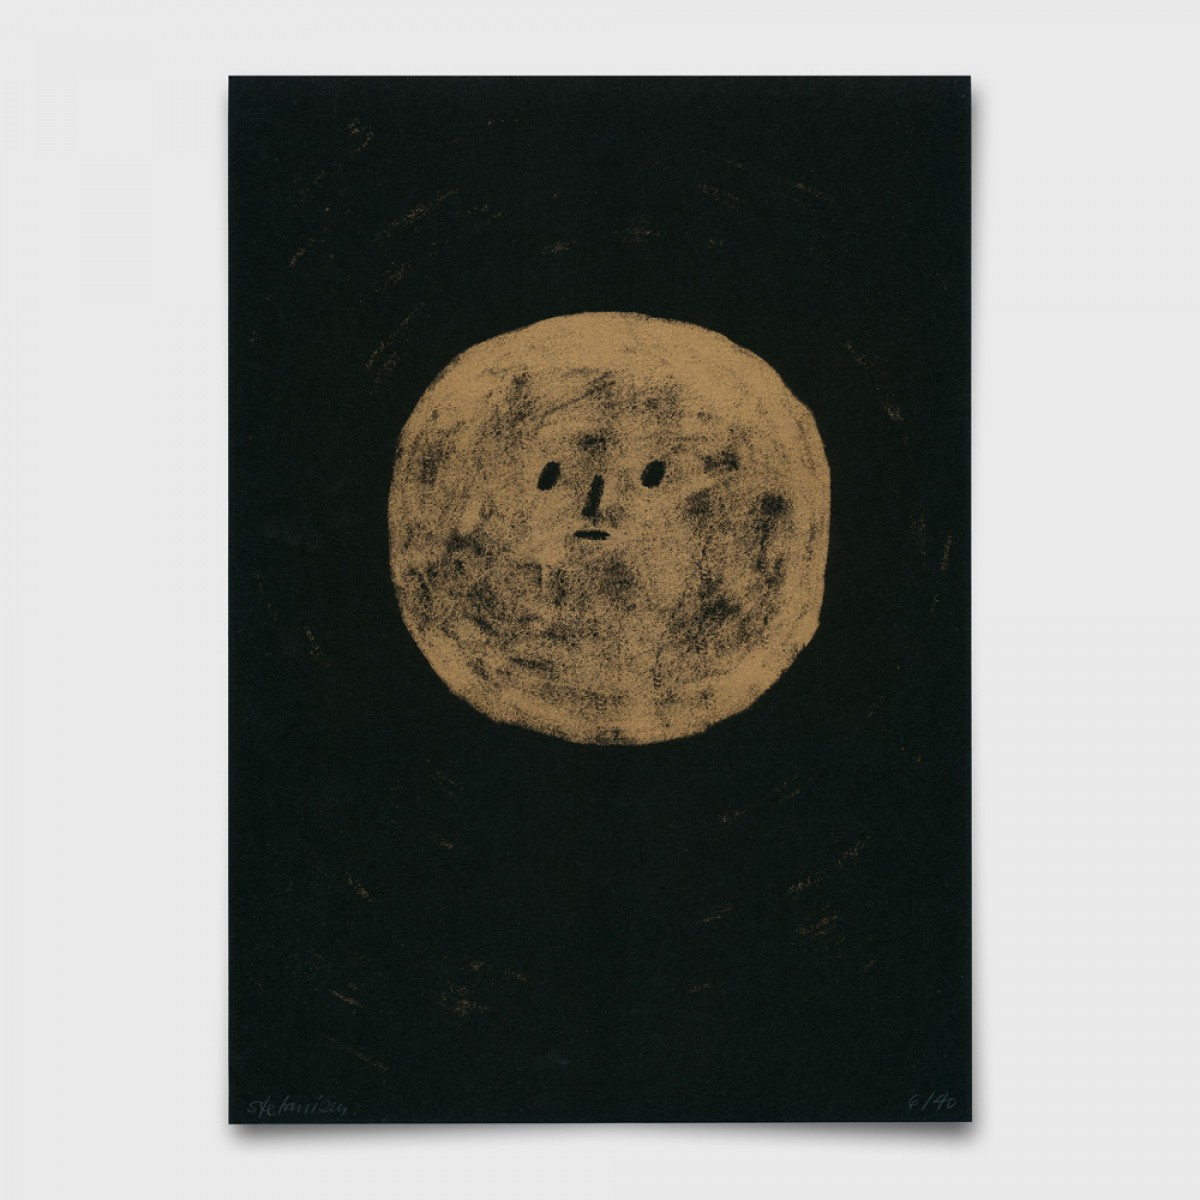 Stefanizen – 'Mond' A4 Riso Print